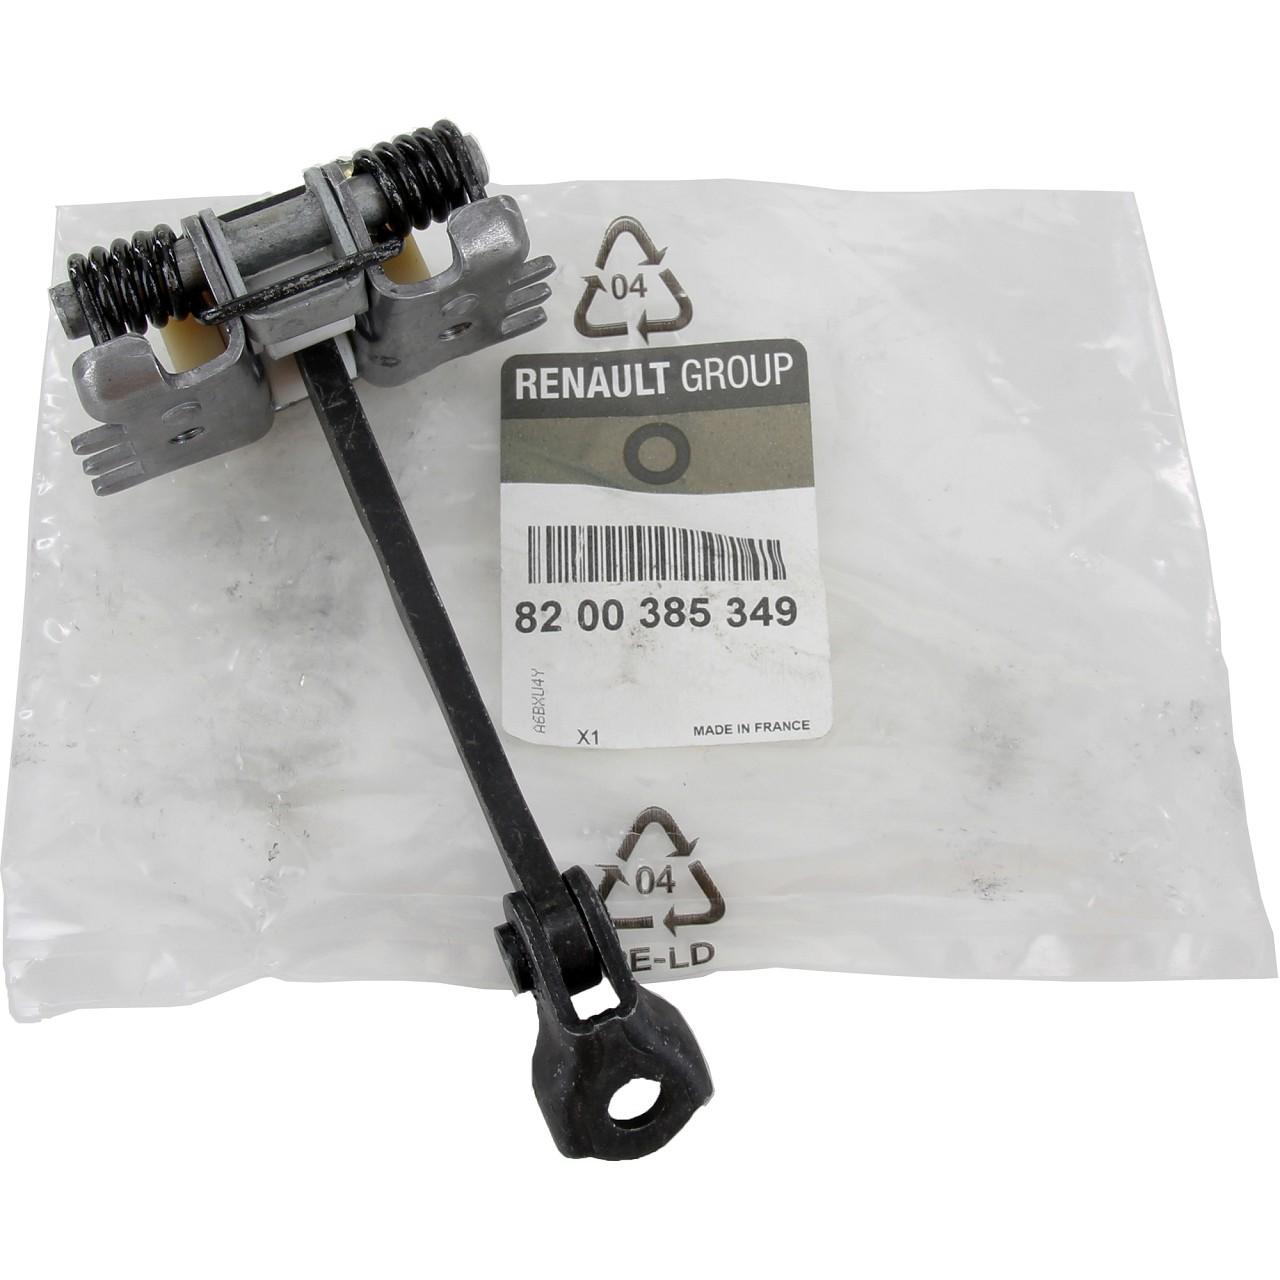 ORIGINAL Renault Türfeststeller Türsteller Türhalteband Türfangband 8200385349